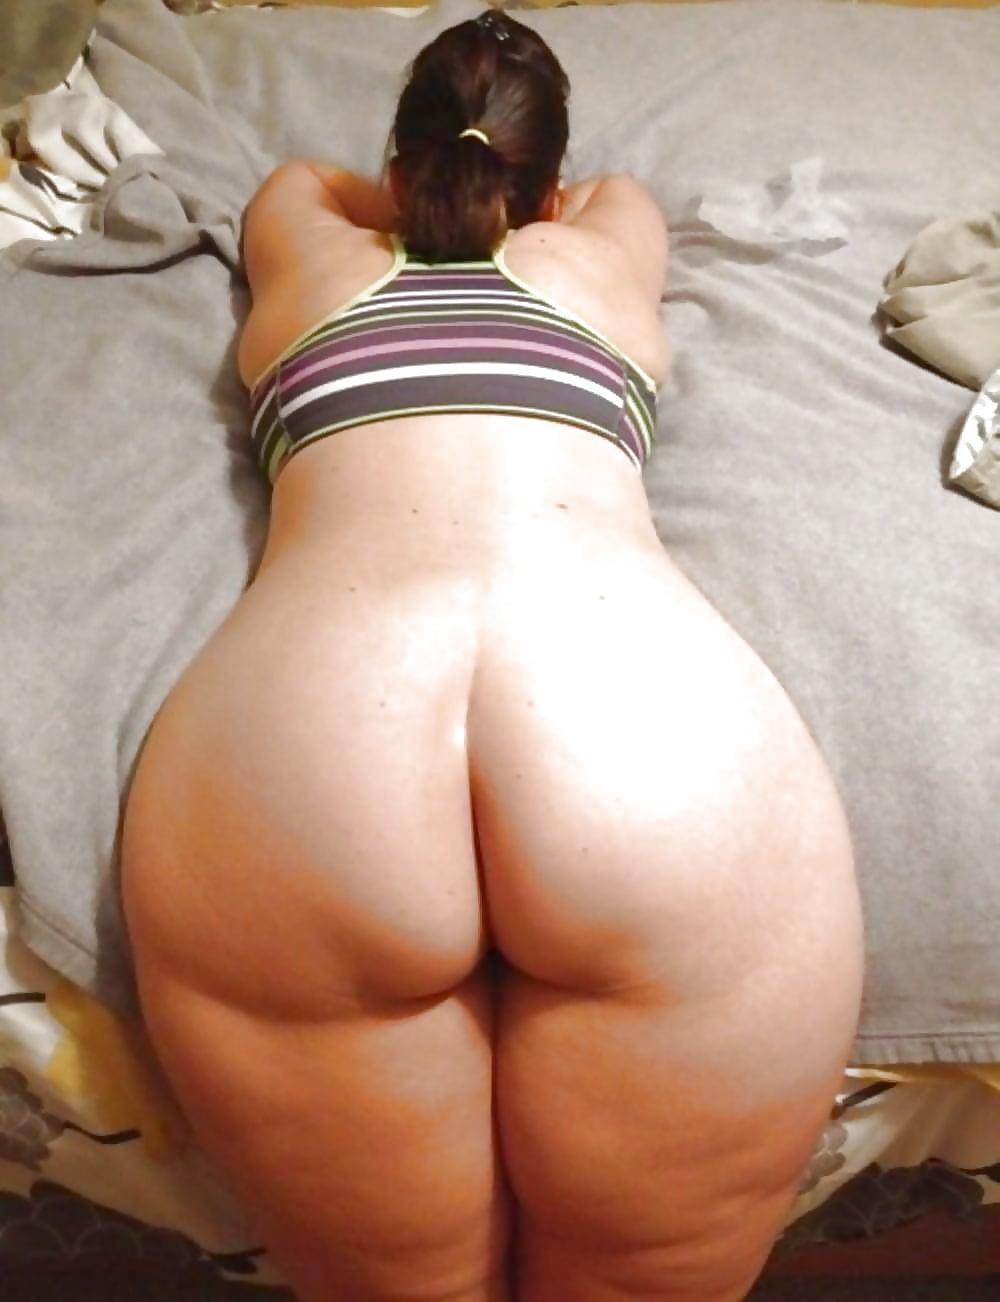 tan-fat-ass-girl-old-man-fucked-girls-photos-amireca